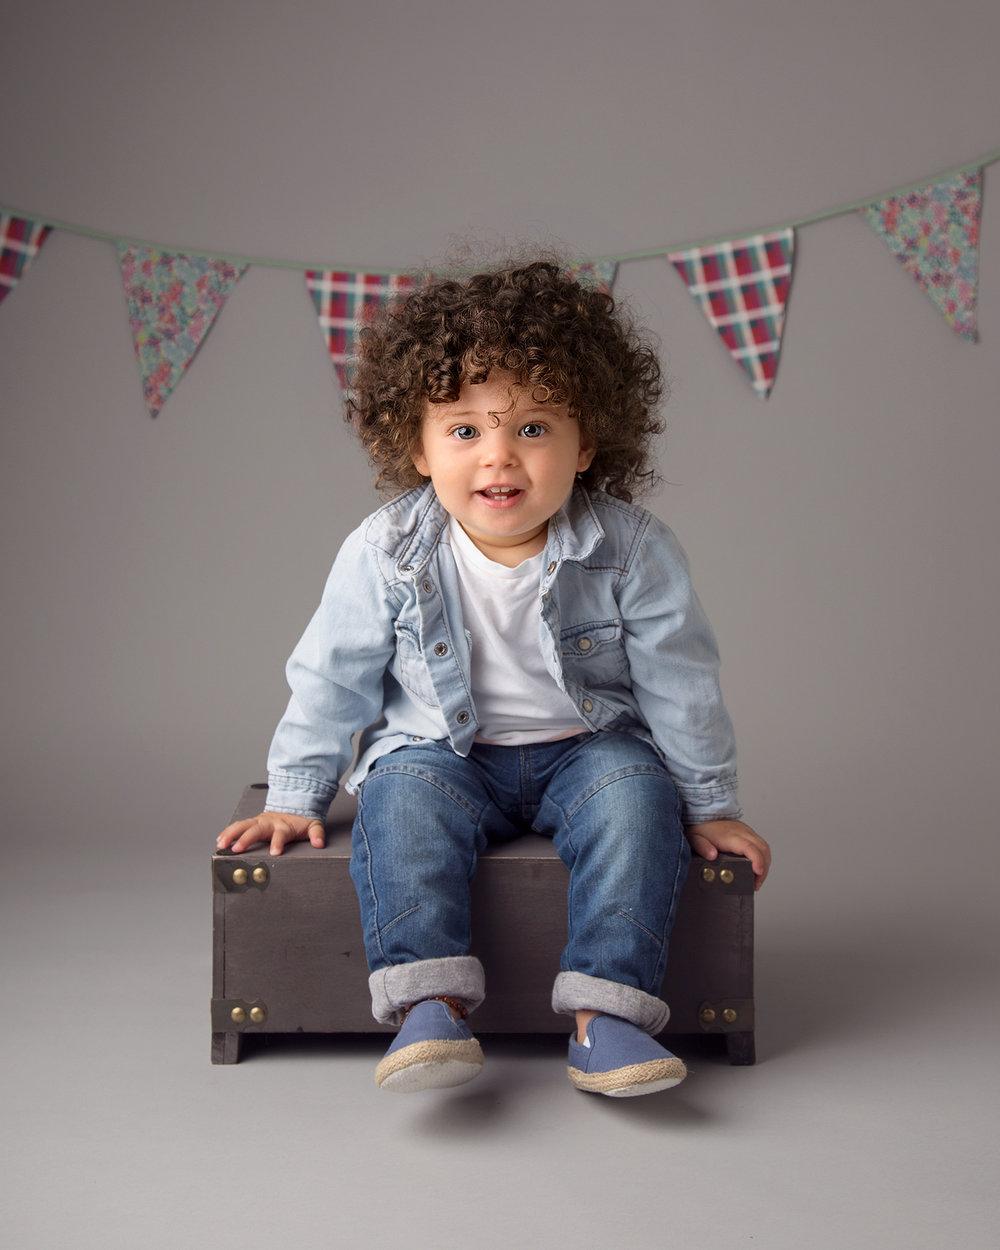 Children's studio photographer Elisabeth Franco Photography Gloucestershire